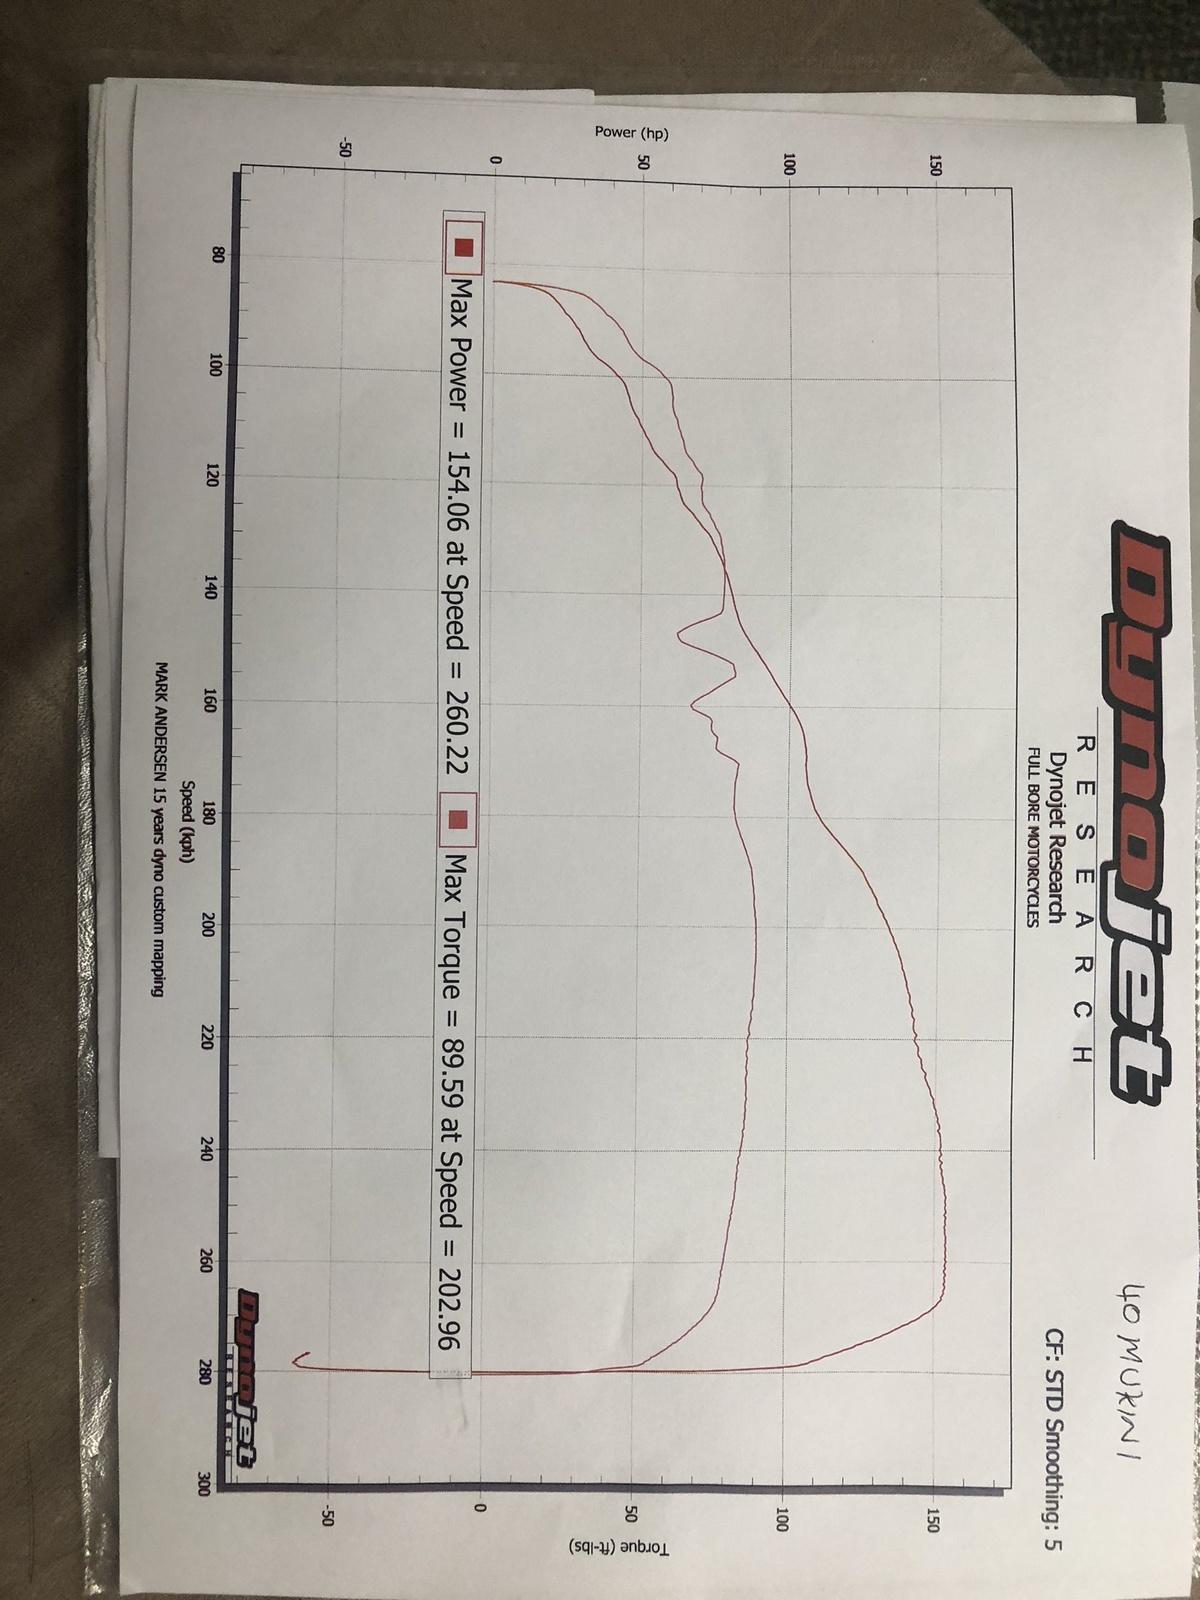 Suzuki Bandit Dyno Graph Results